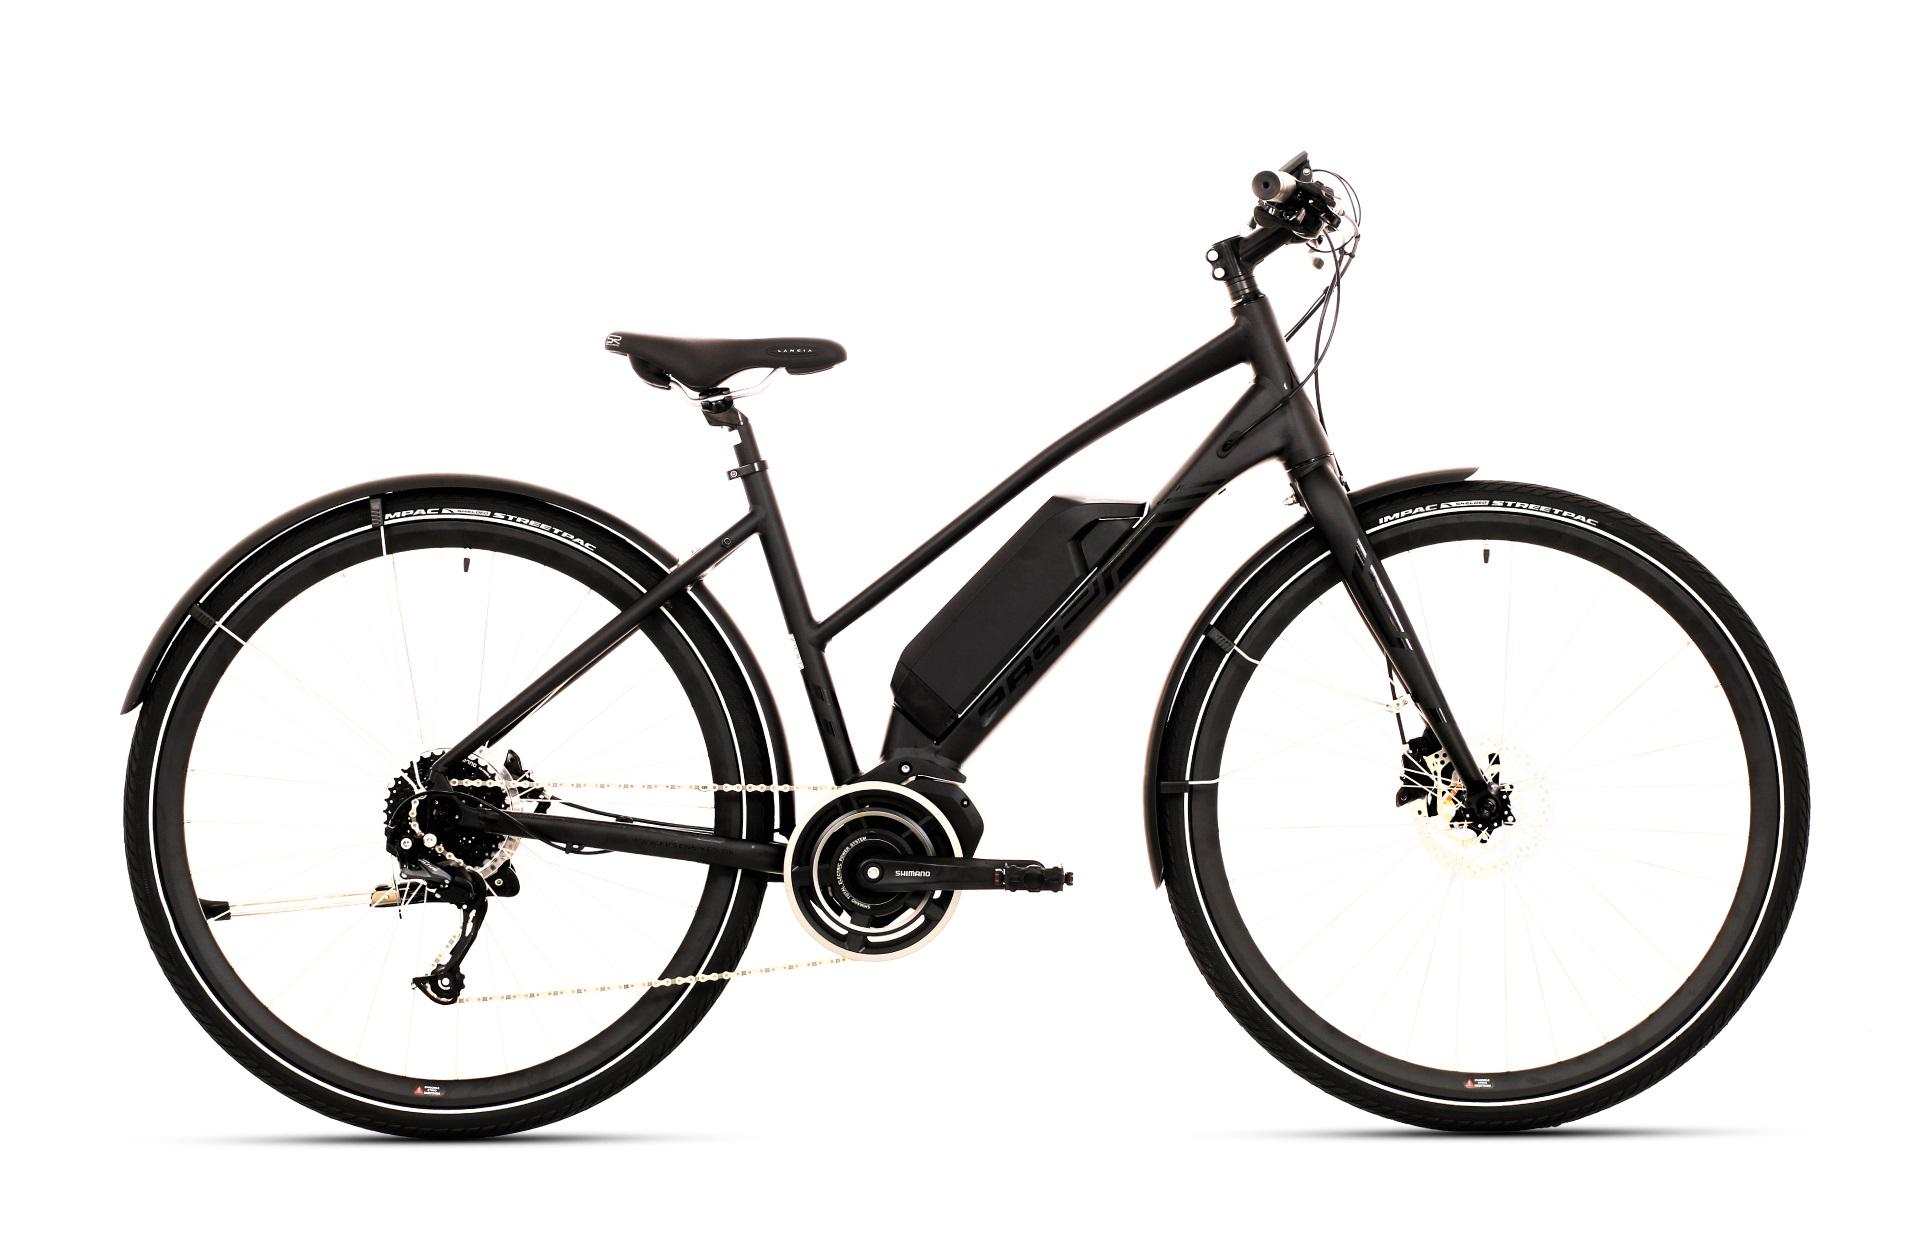 Ebsen Ebs Speed Steps Dame Elcykel 9 Gear Matsort 47Cm - 2019 Mærker